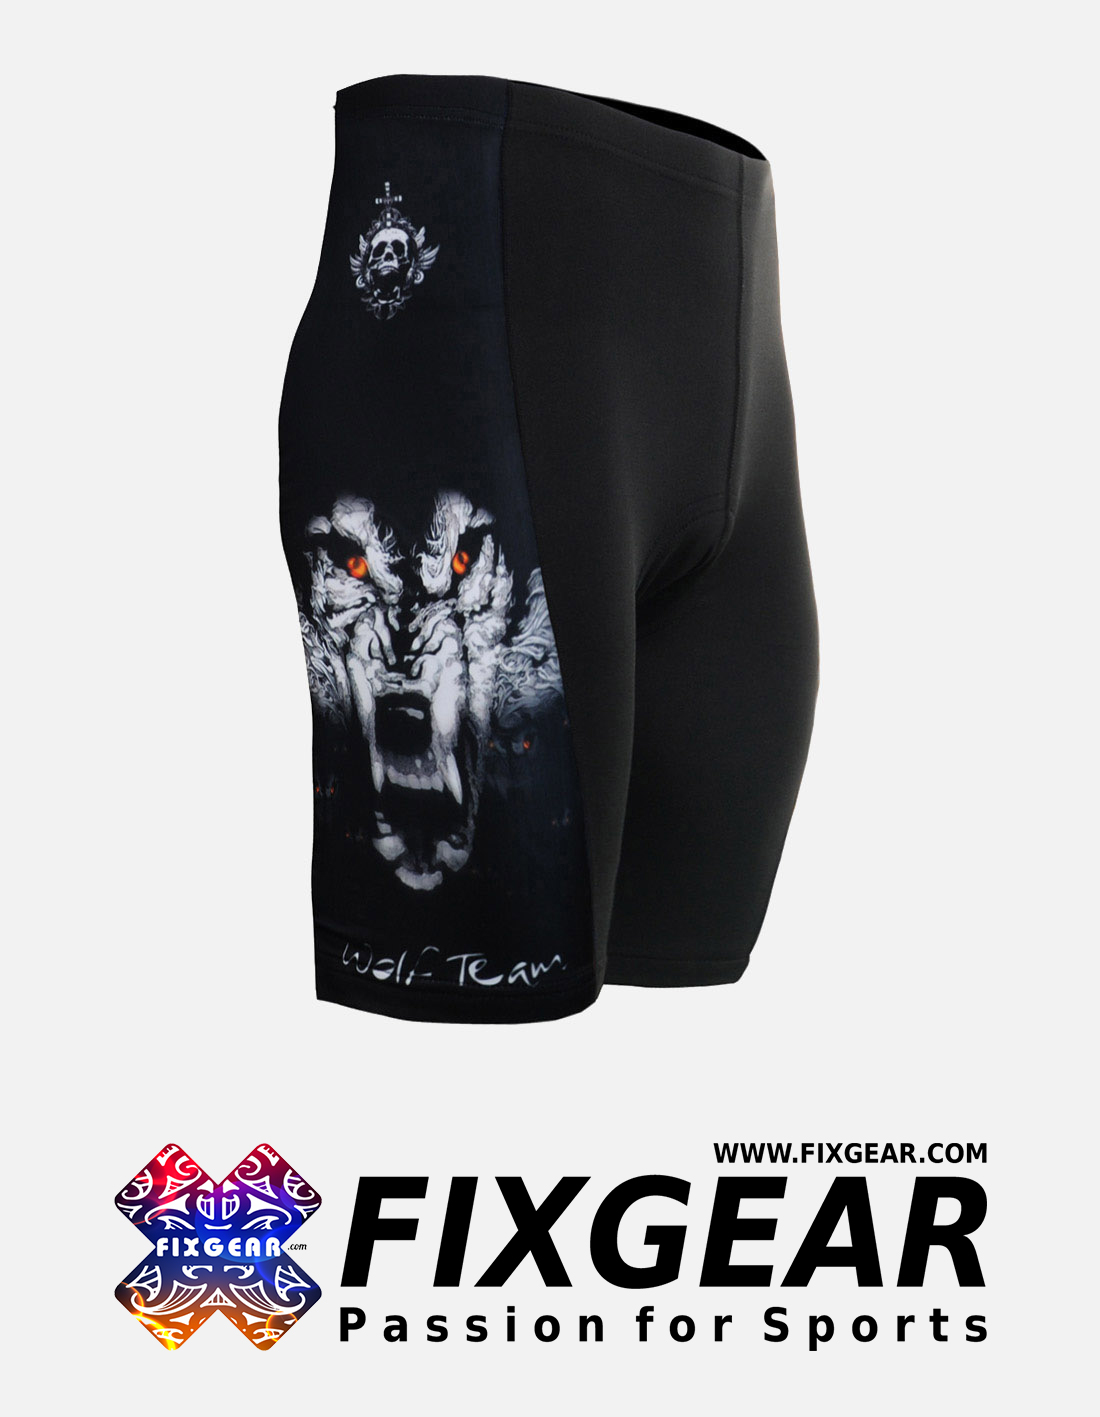 FIXGEAR ST-W18 Women's Cycling Padded Shorts